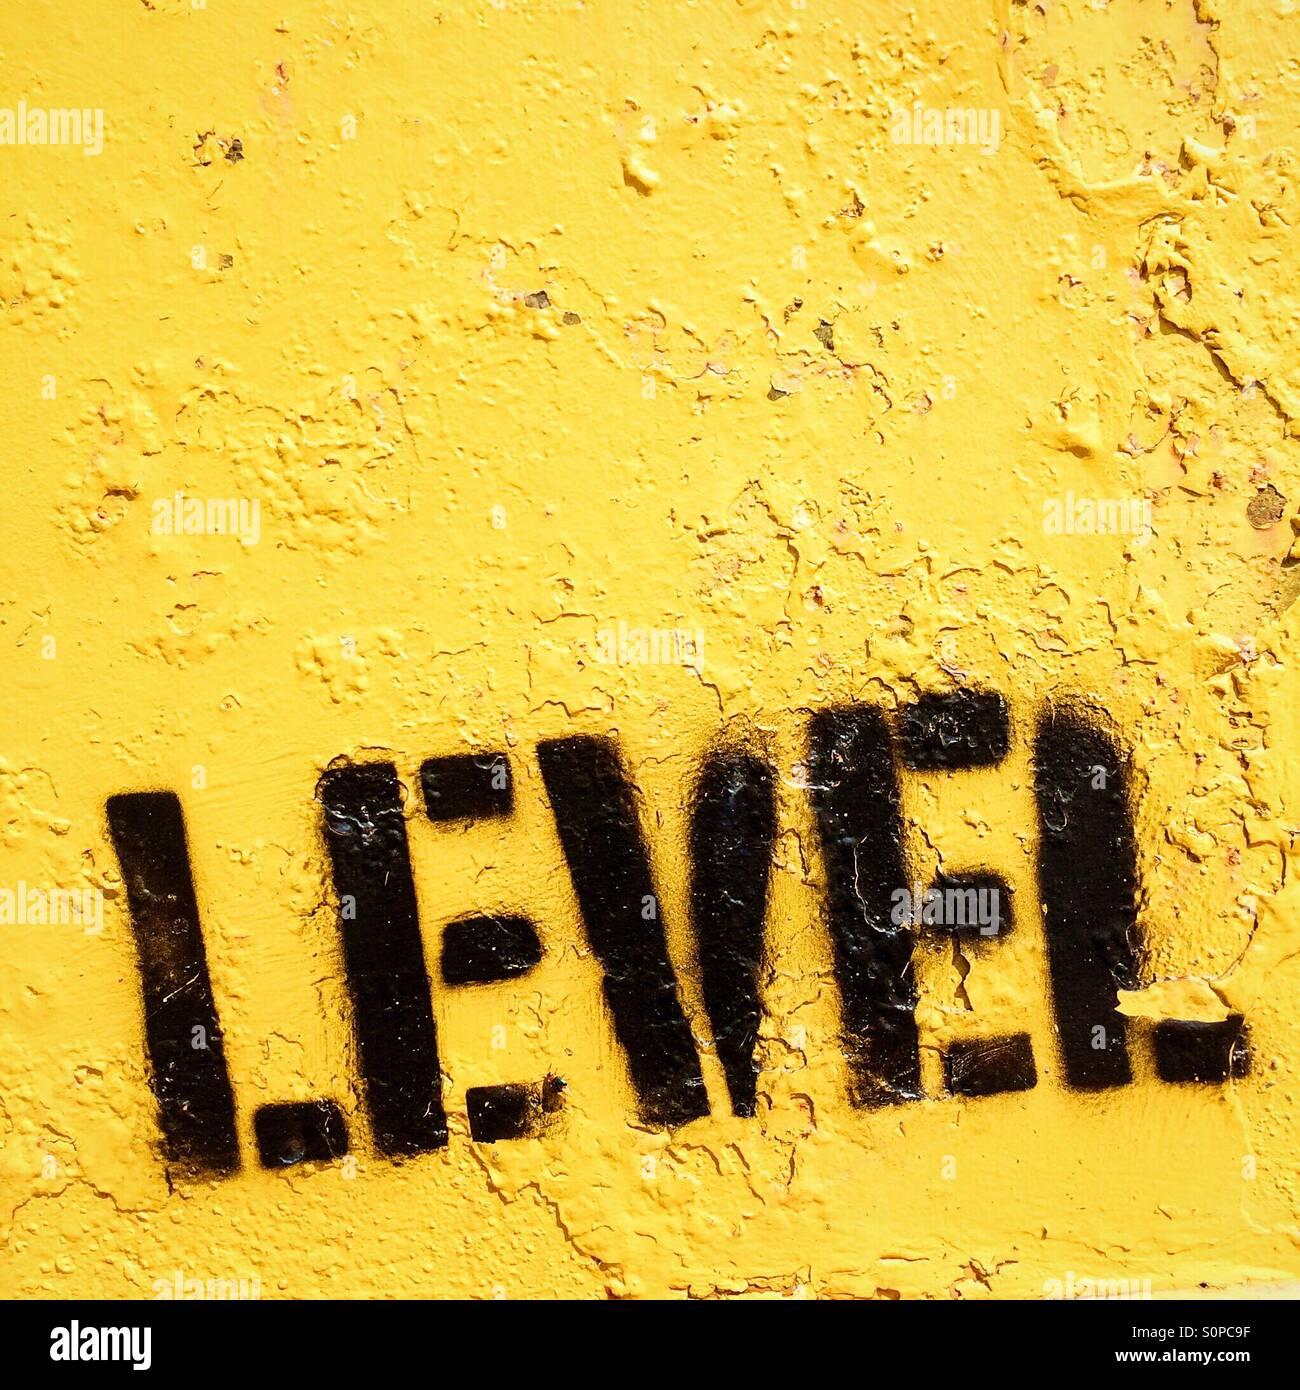 Nivel estampadas en la pintura negra sobre fondo amarillo Foto de stock